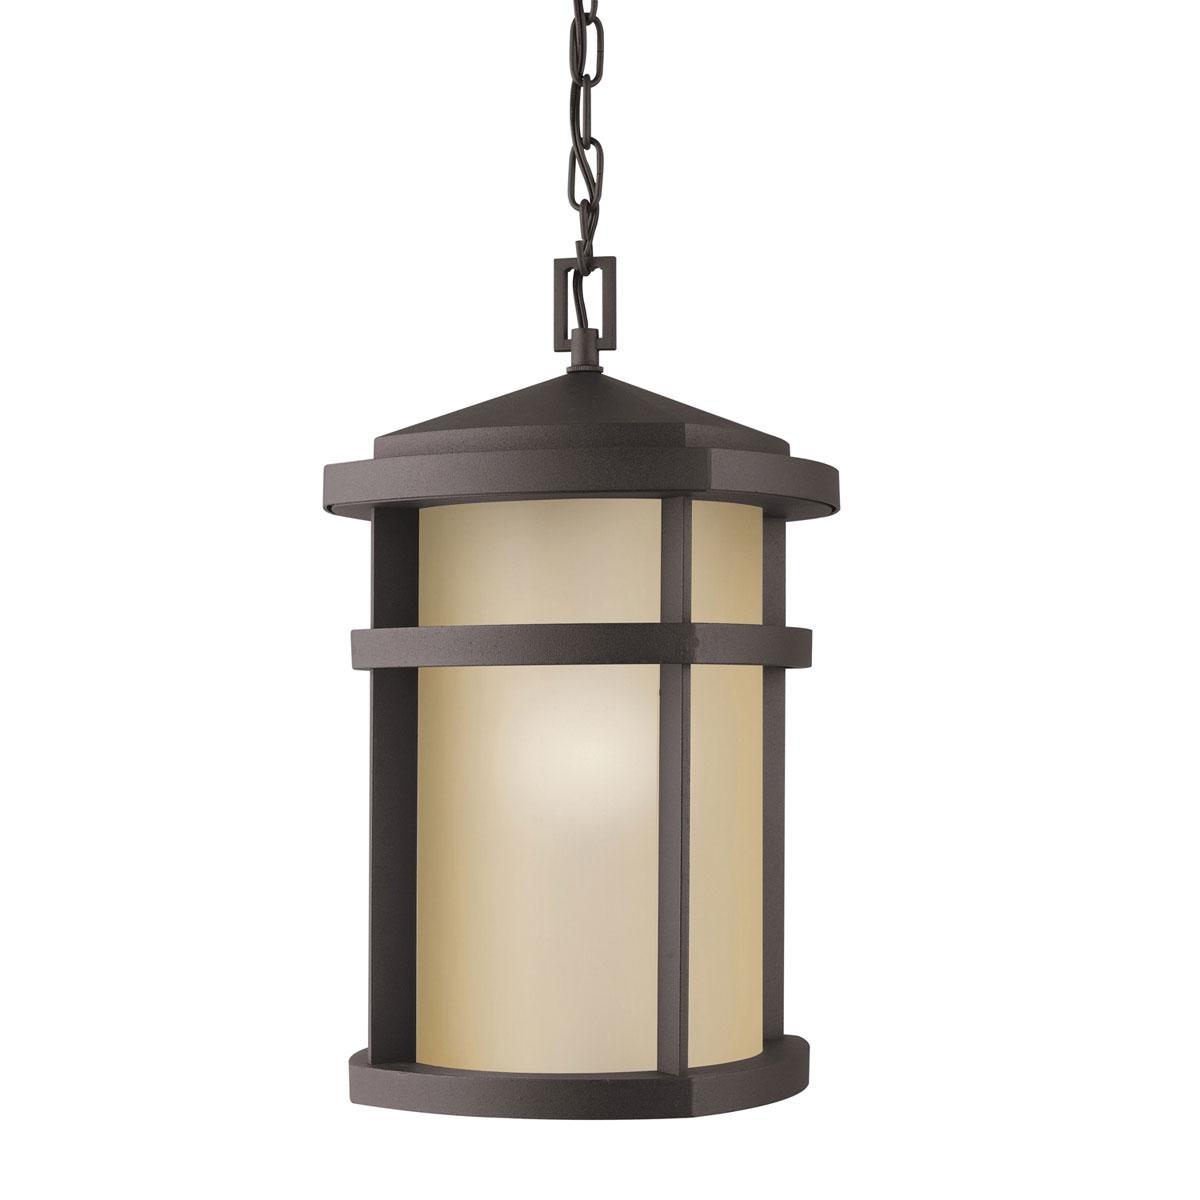 Contemporary Outdoor Pendant Lighting, Outdoor Pergola Lighting Throughout Most Popular Contemporary Outdoor Pendant Lighting (View 7 of 20)